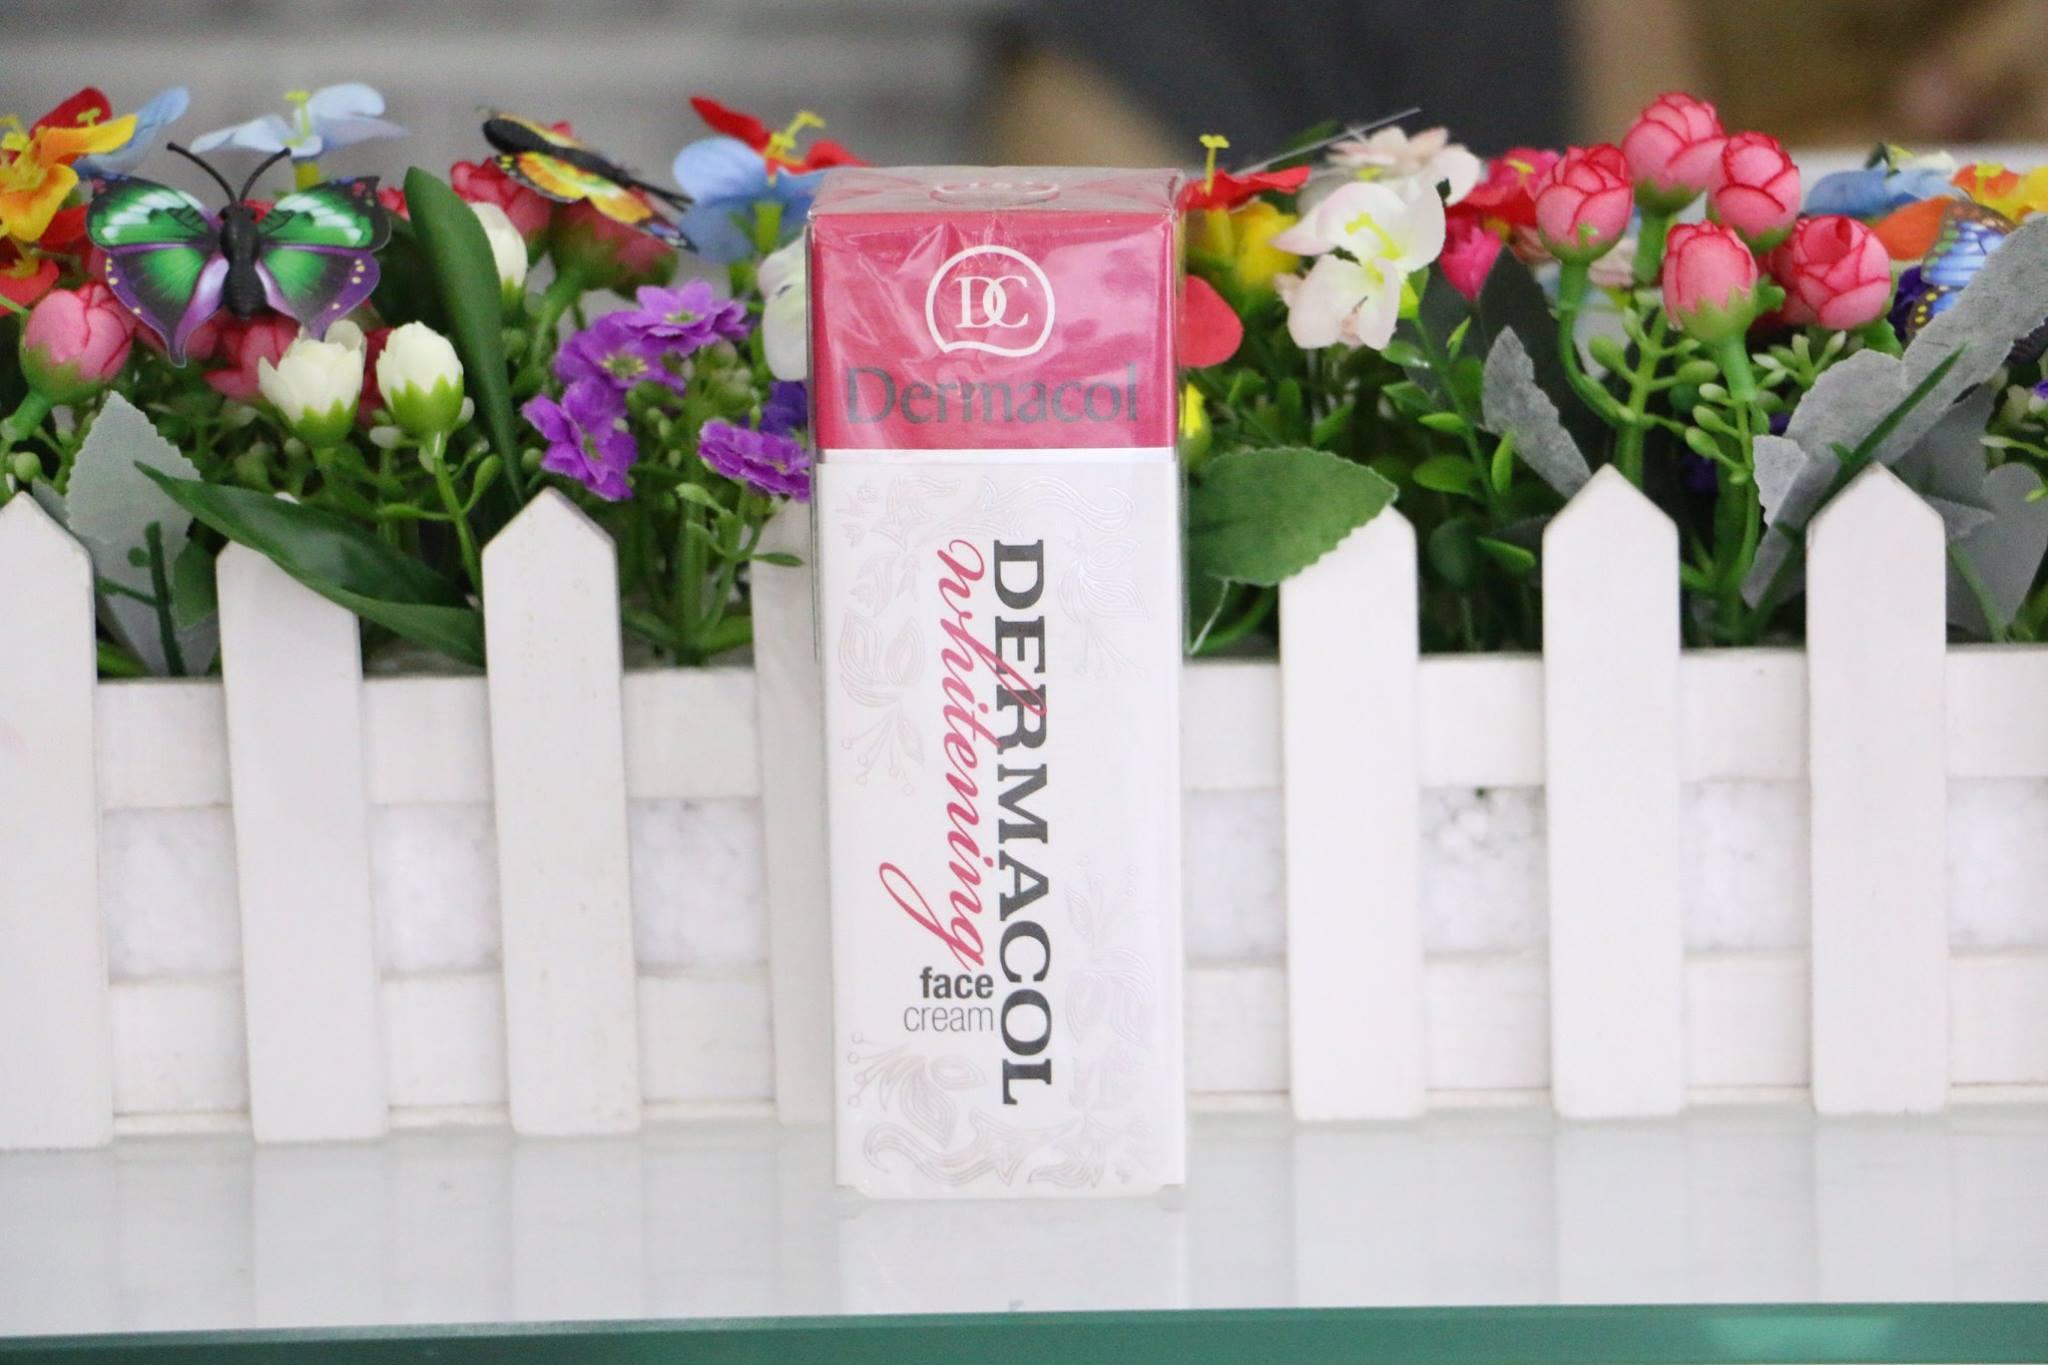 kem-duong-dermacol-skincare-whitening-face-cream-01